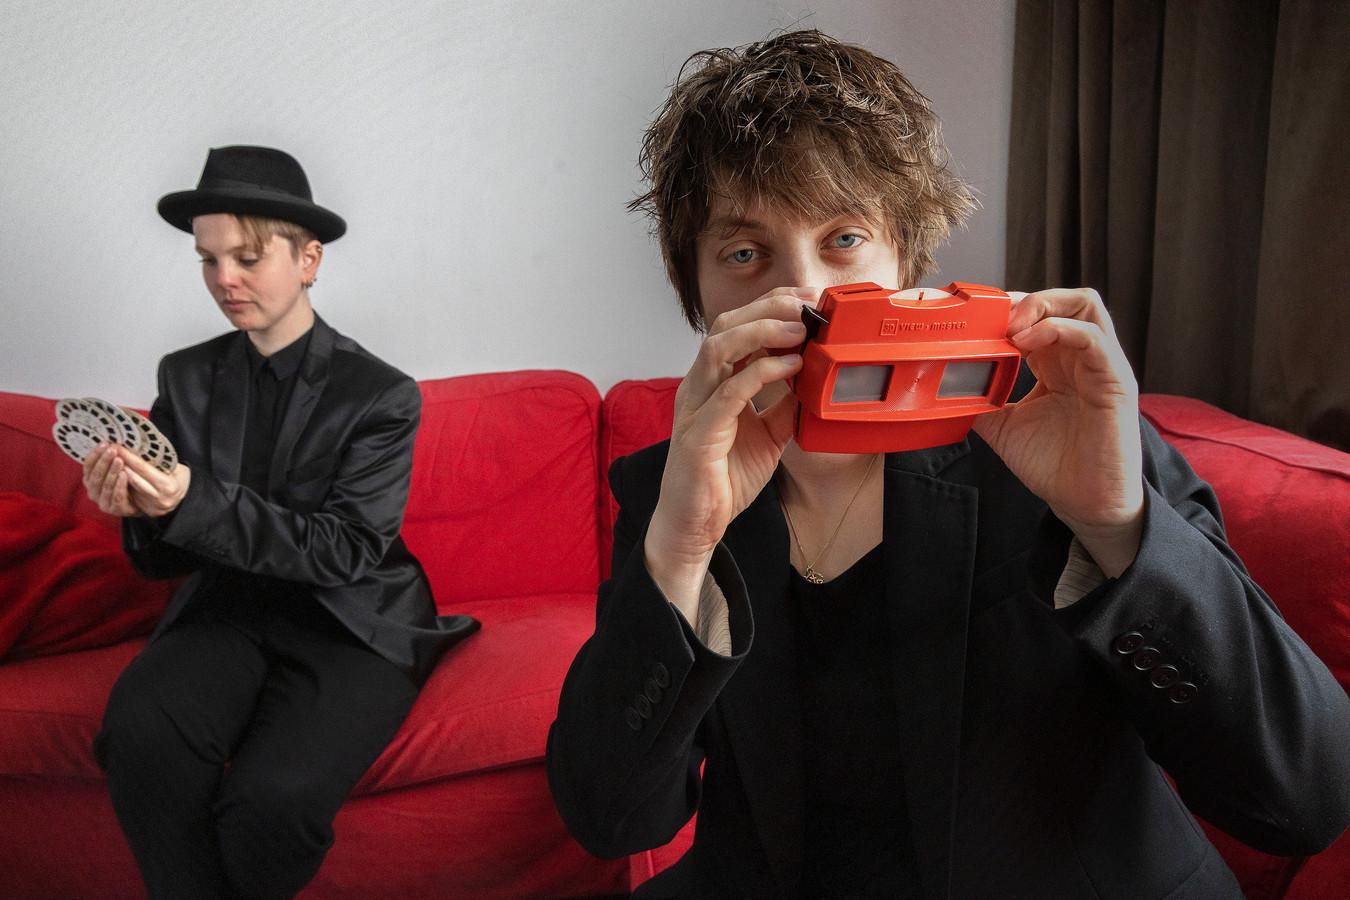 Lilia Scheerder en Monique Hendriks